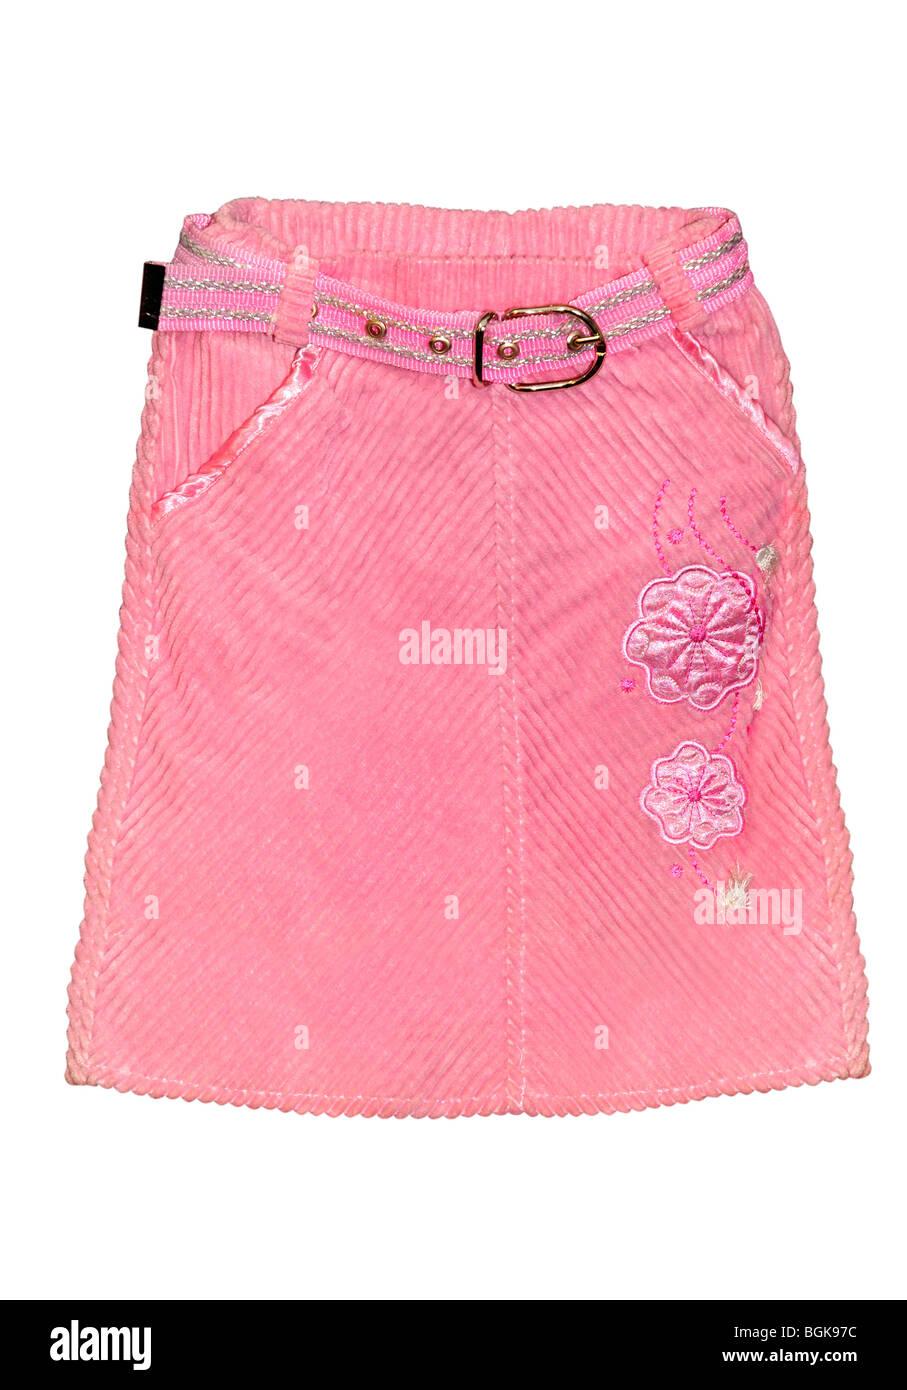 Purple Skirt Imágenes De Stock & Purple Skirt Fotos De Stock - Alamy